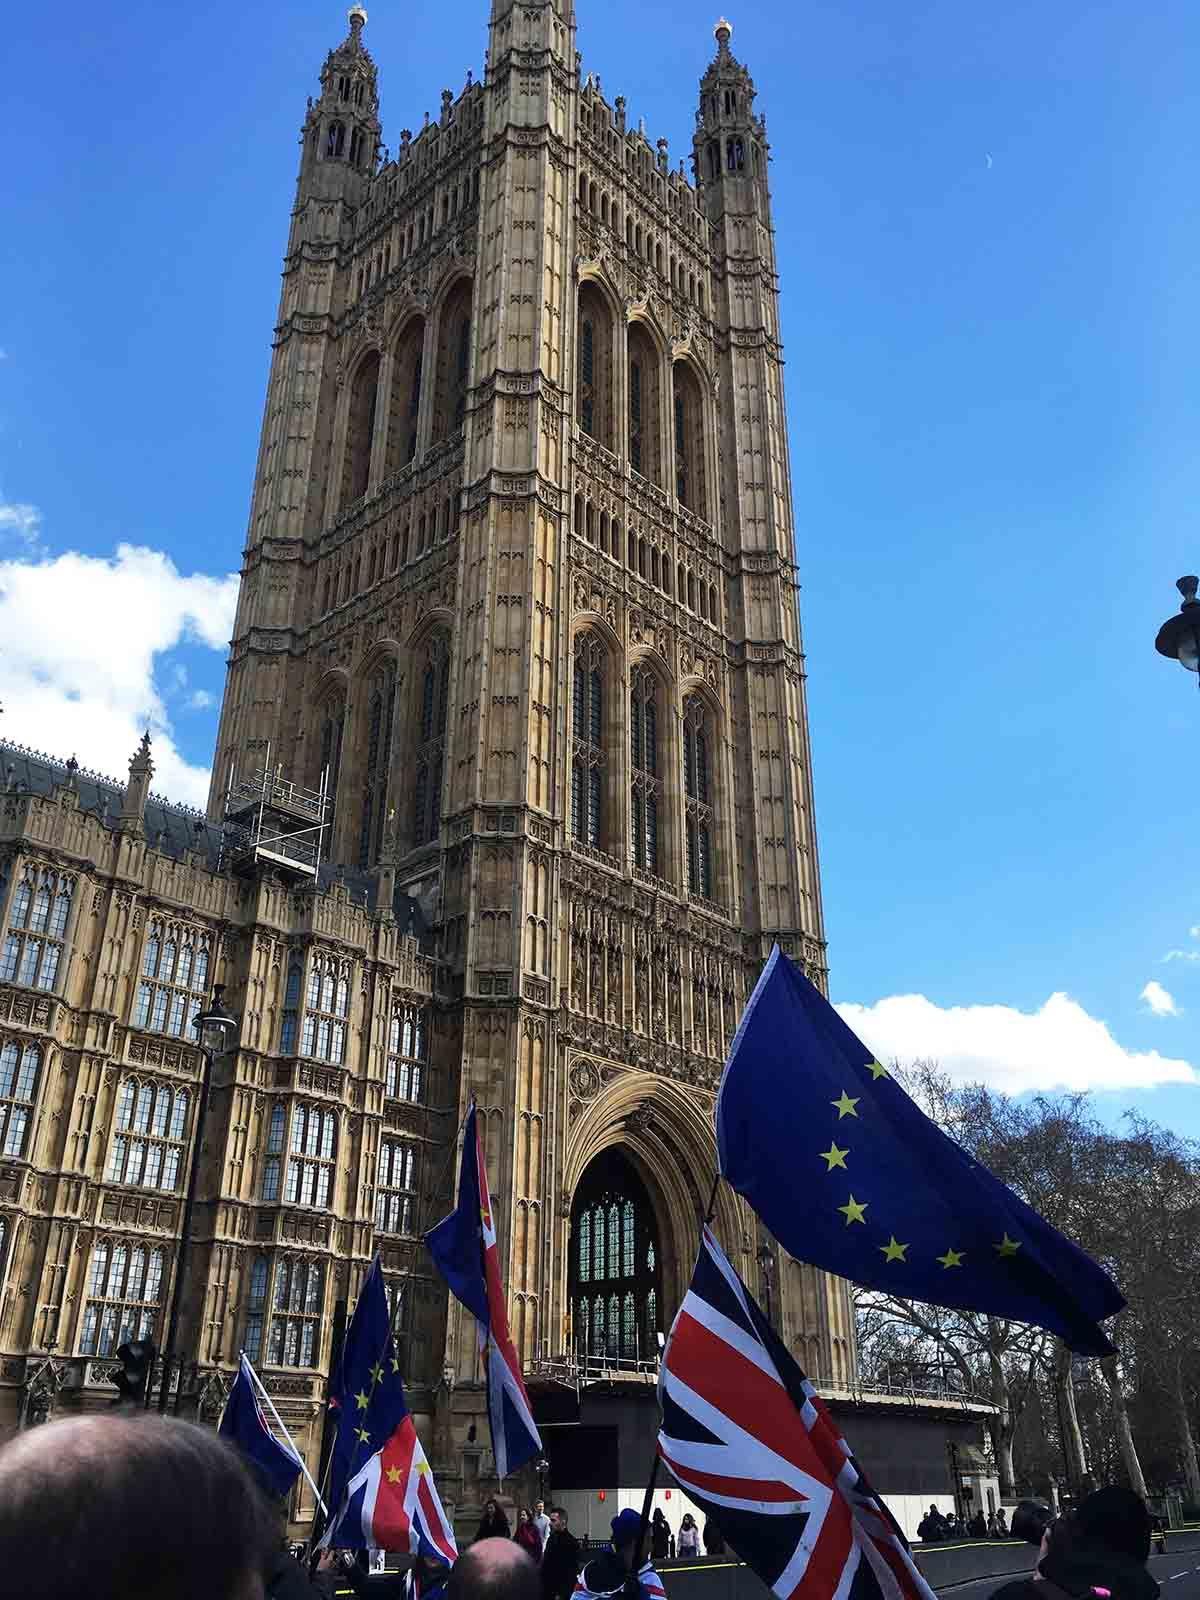 Das Parlamentsgebäude in London mit Demonstranten davor